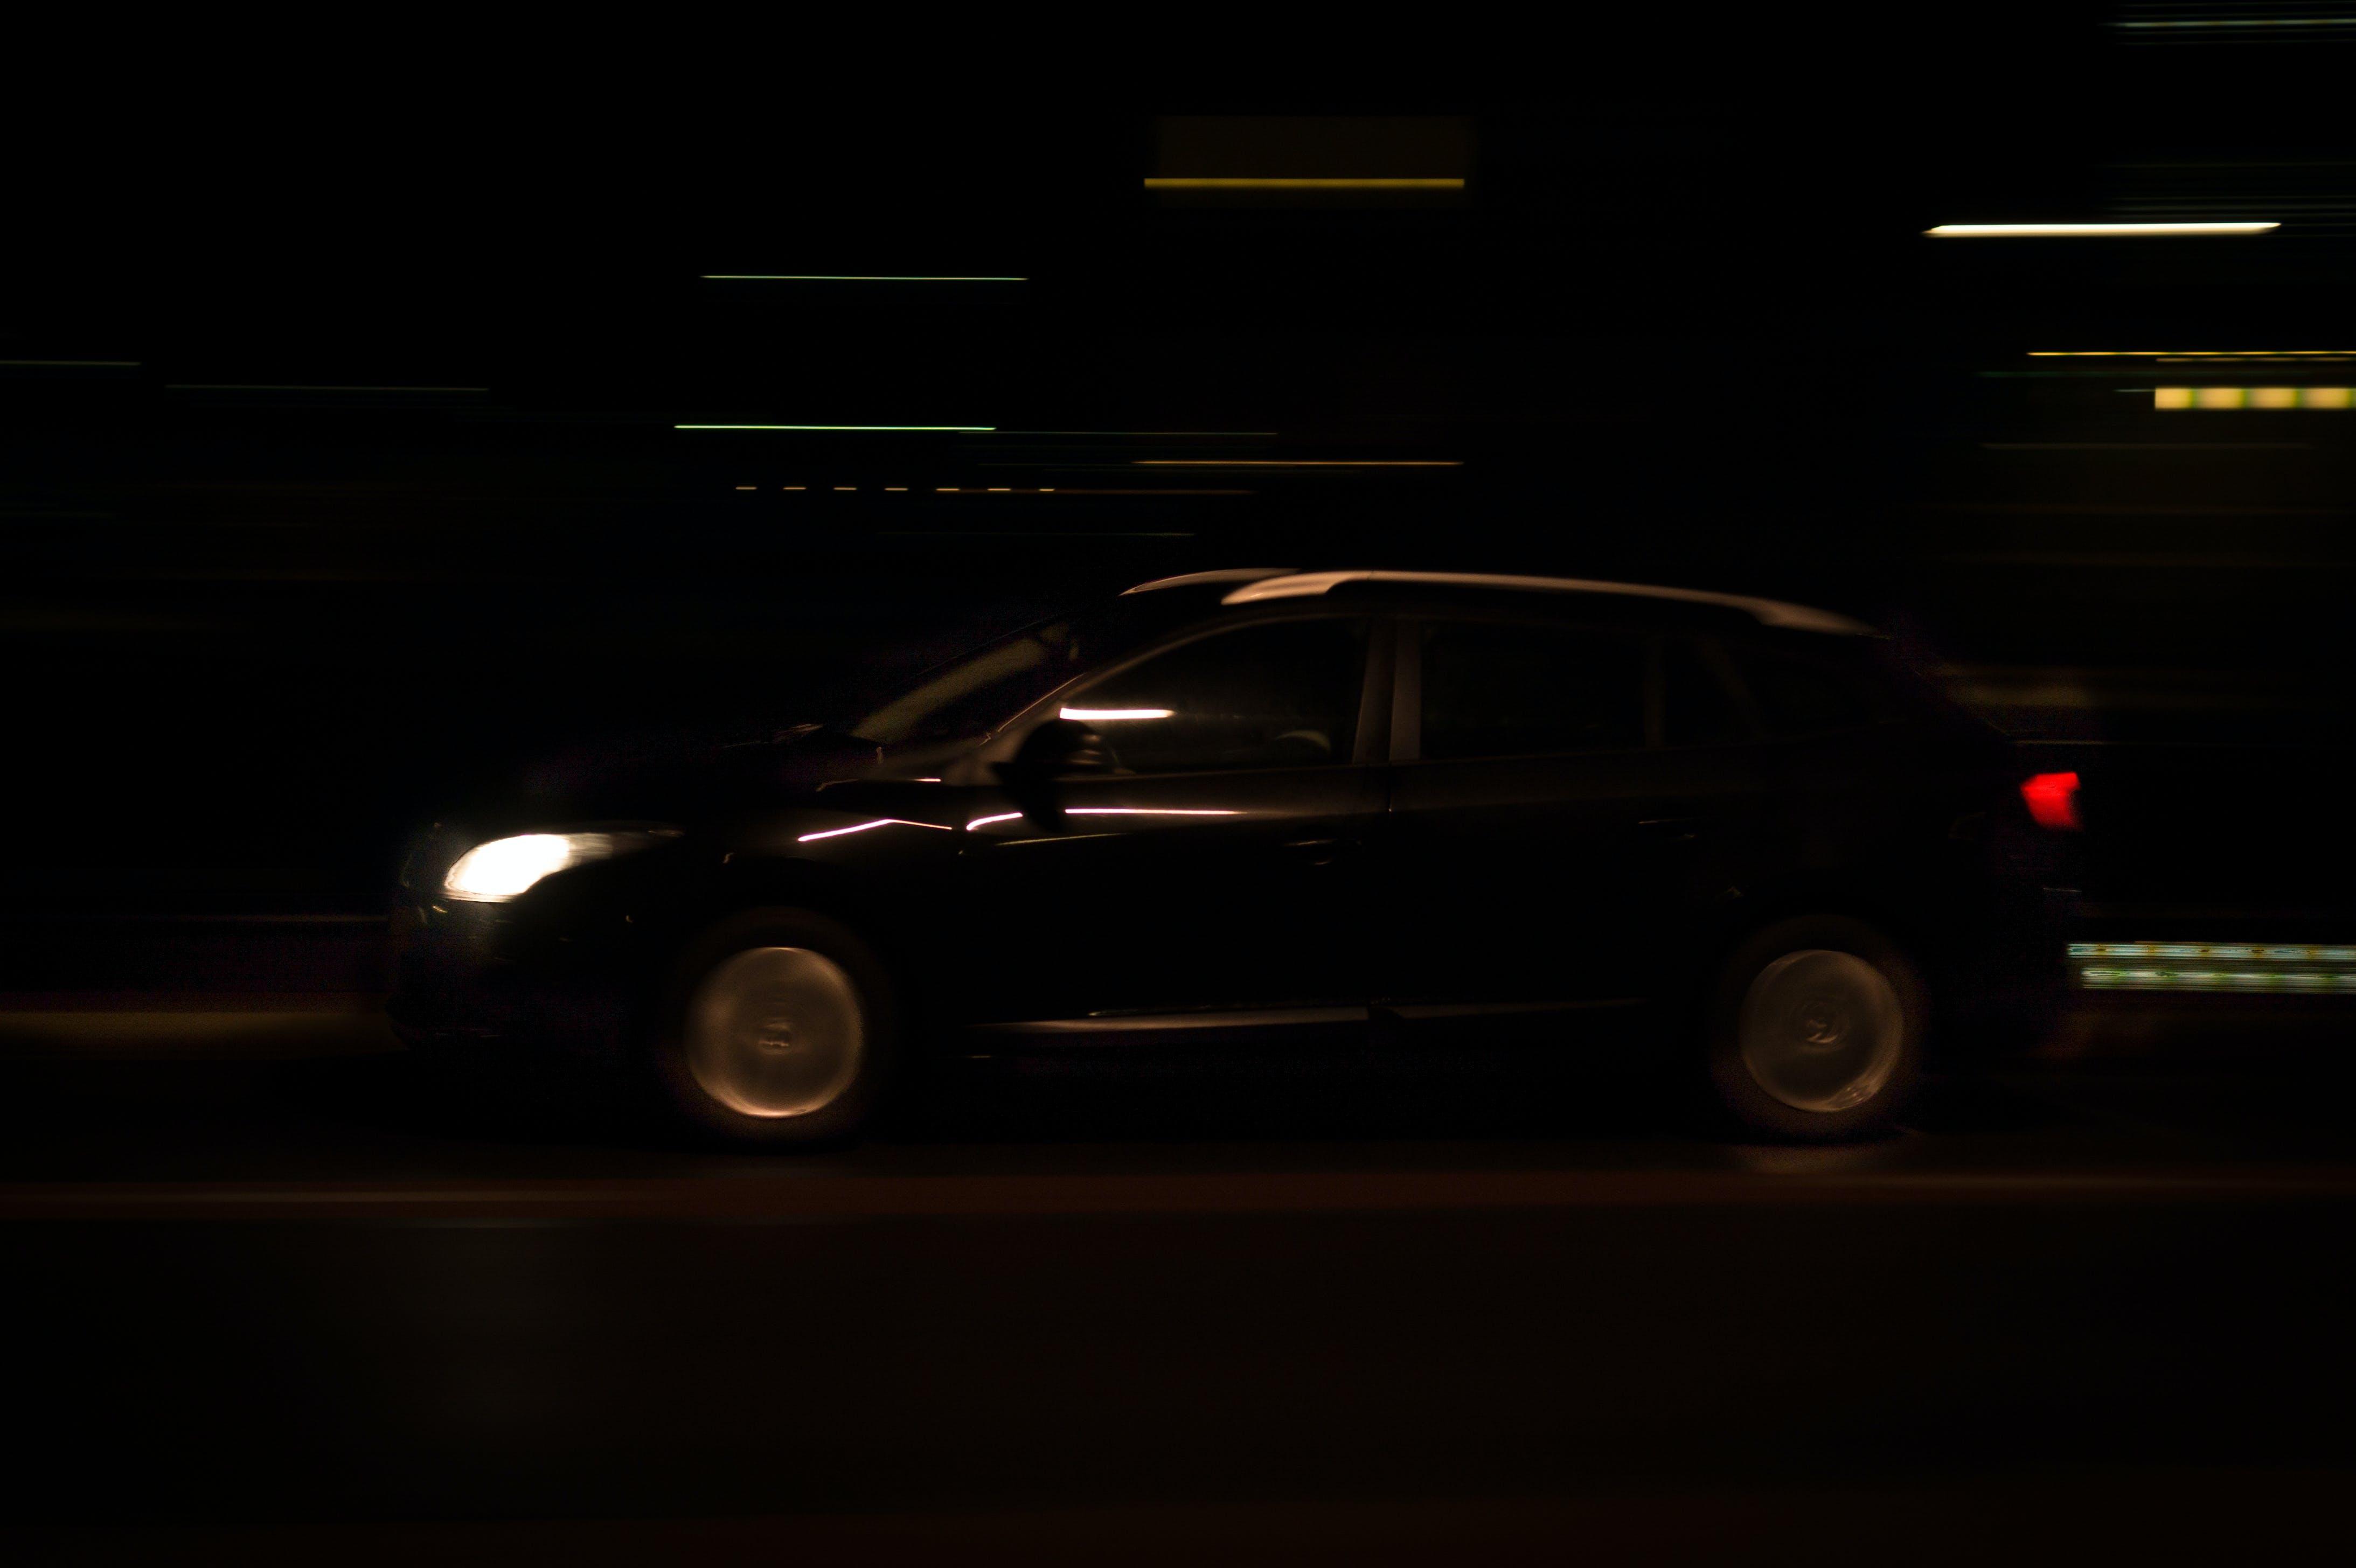 car, driving, lights